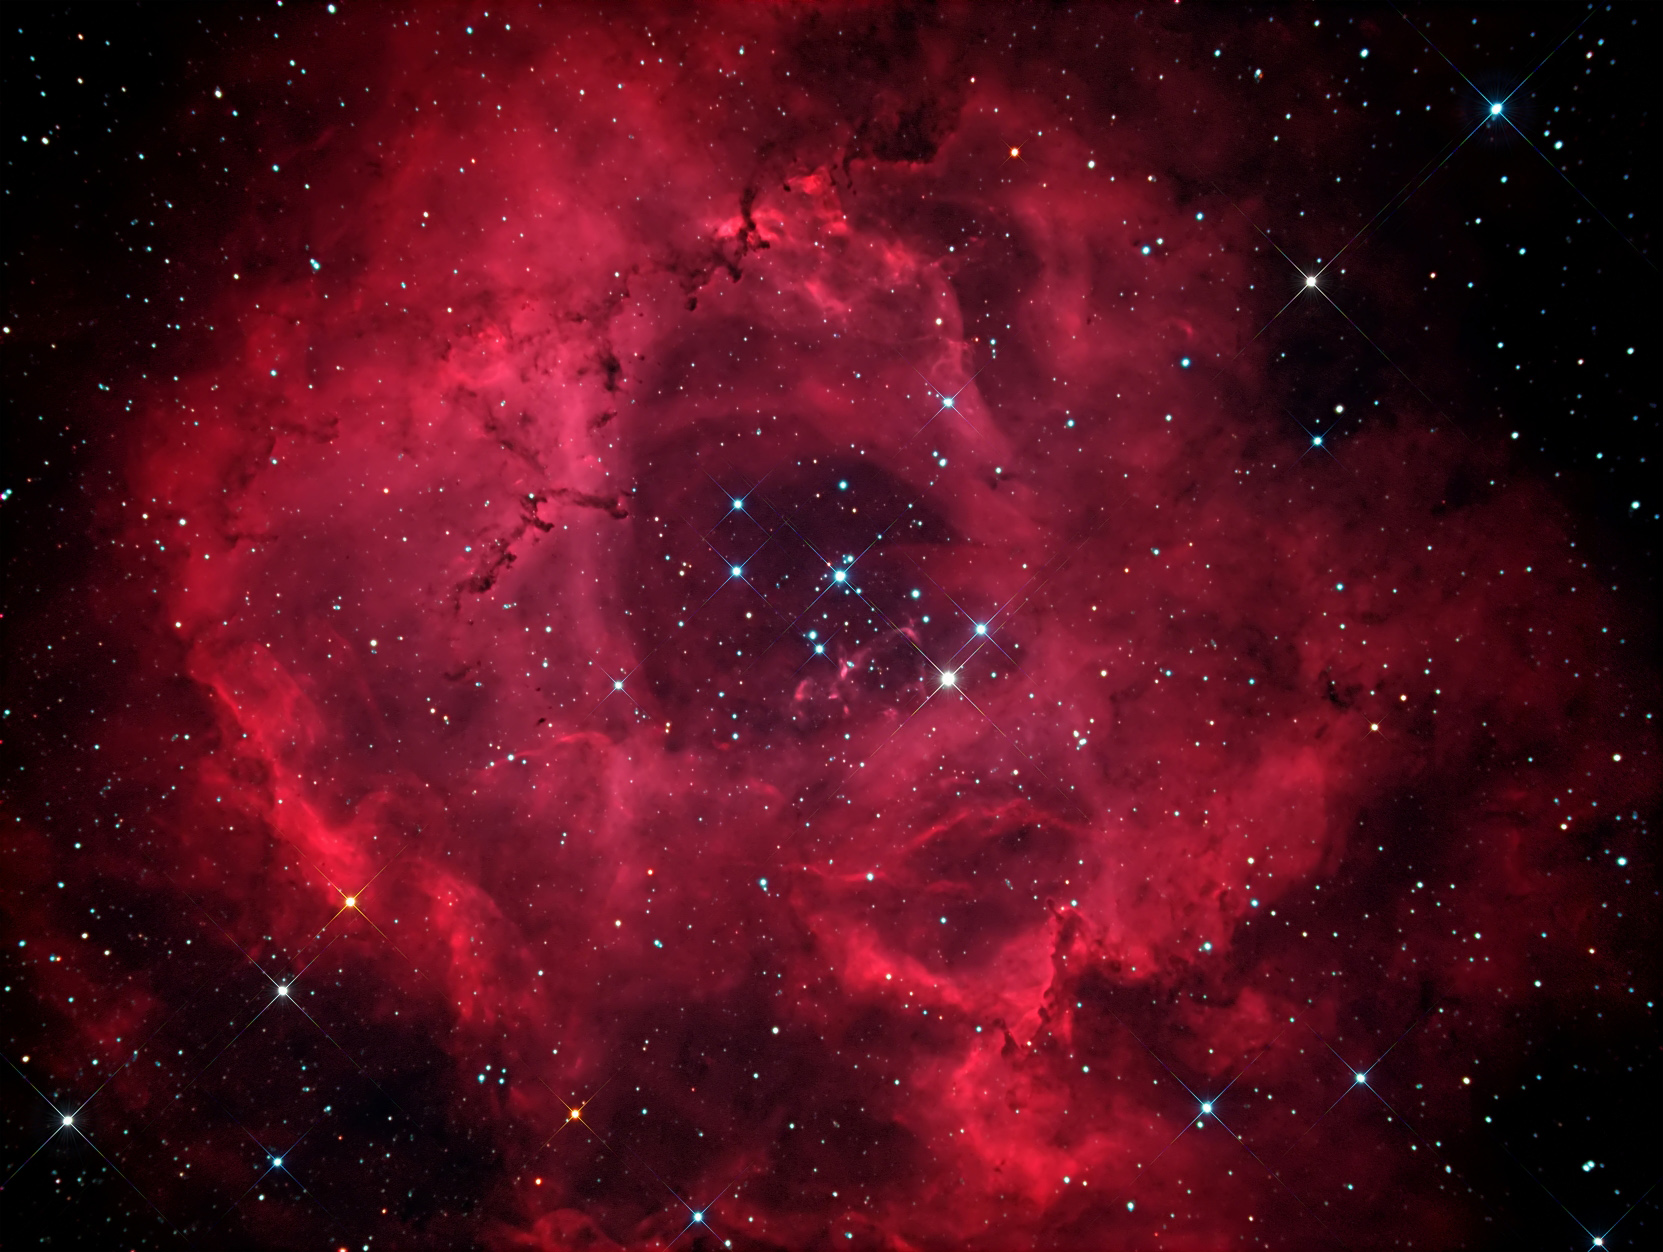 Rosette Nebula by Brian Davis